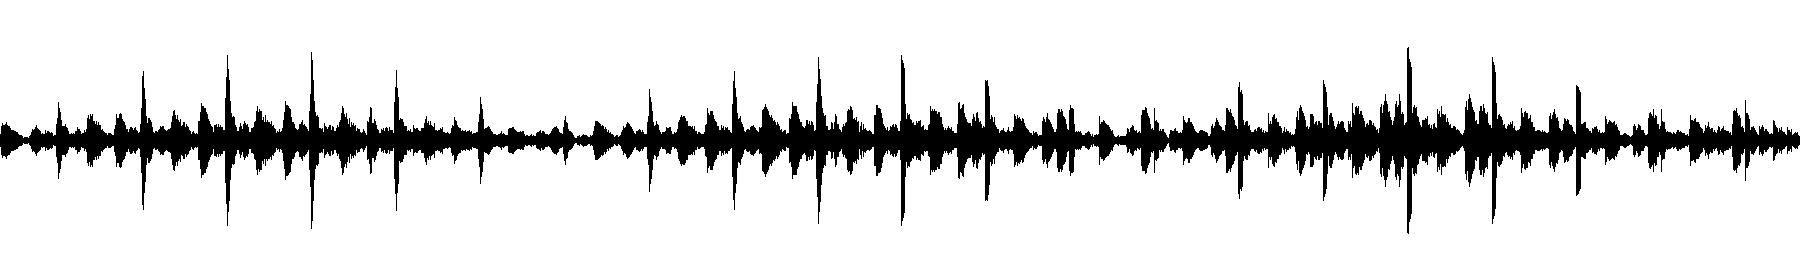 27 synth loop g